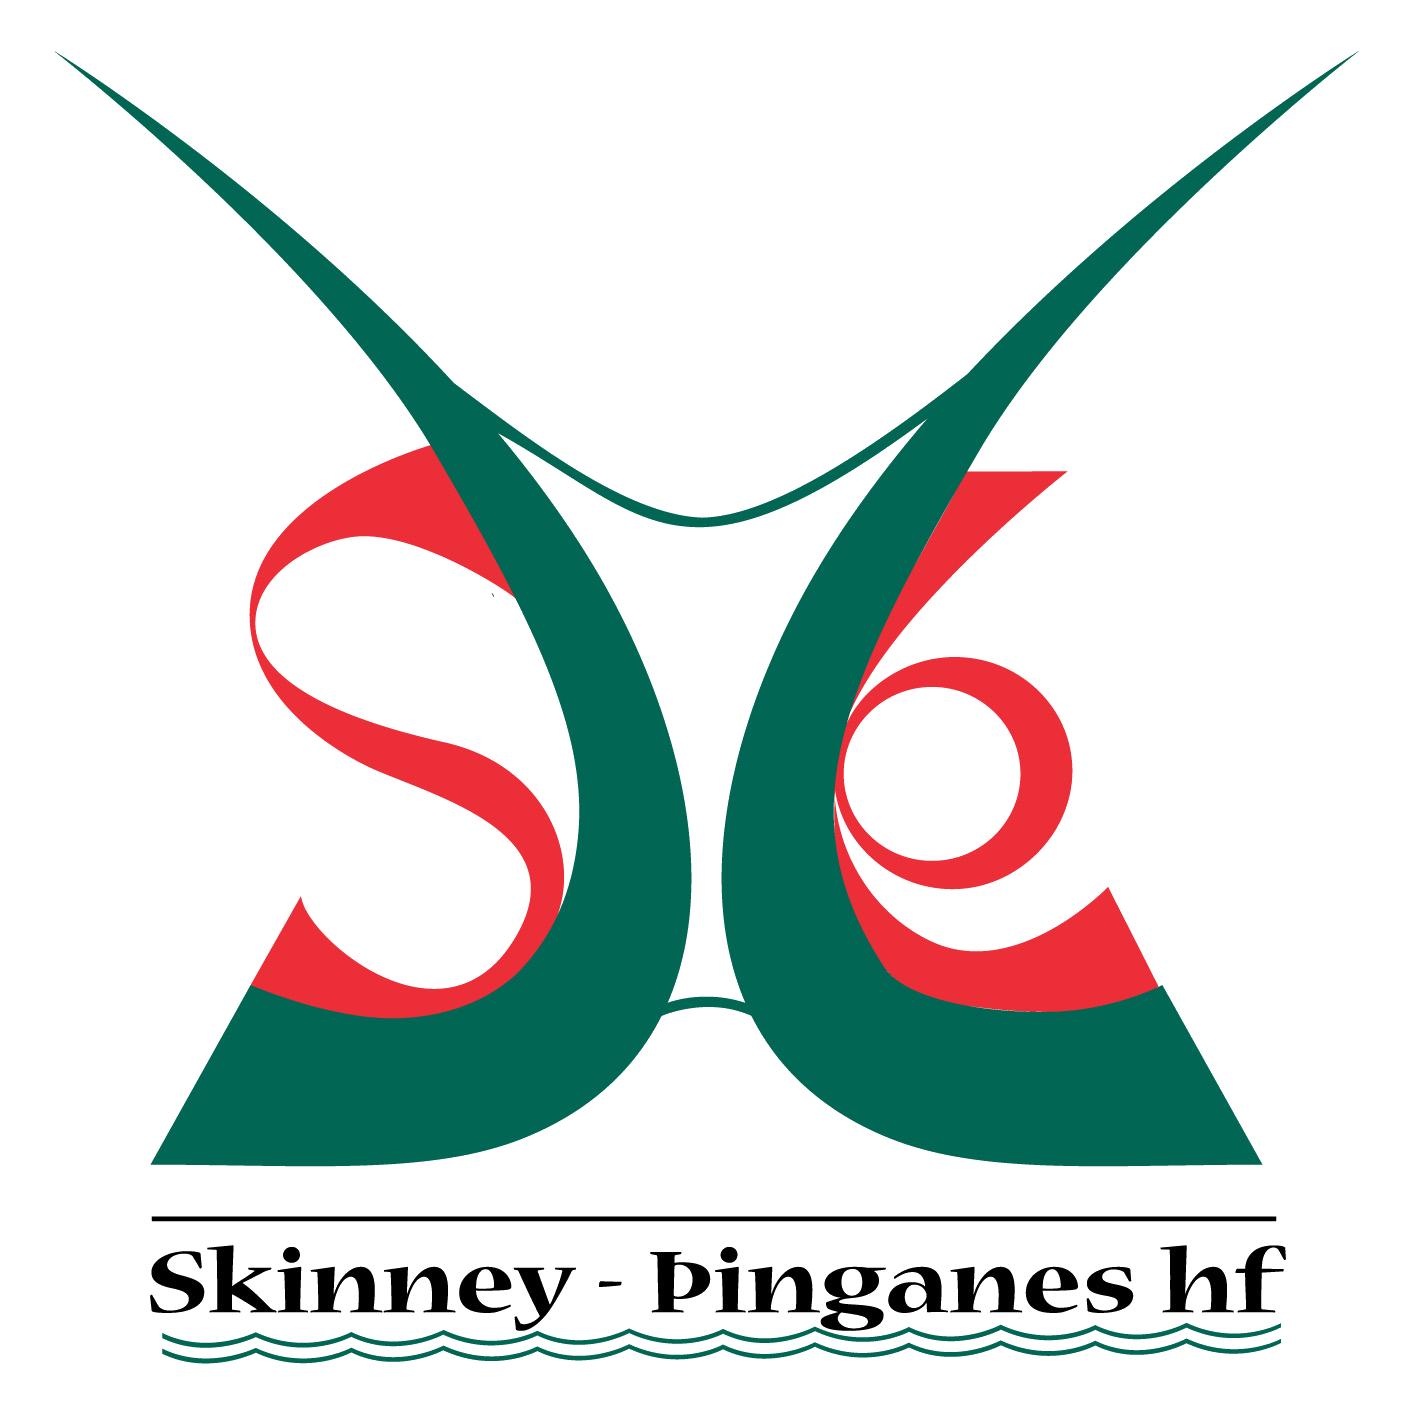 Skinney - Þinganes